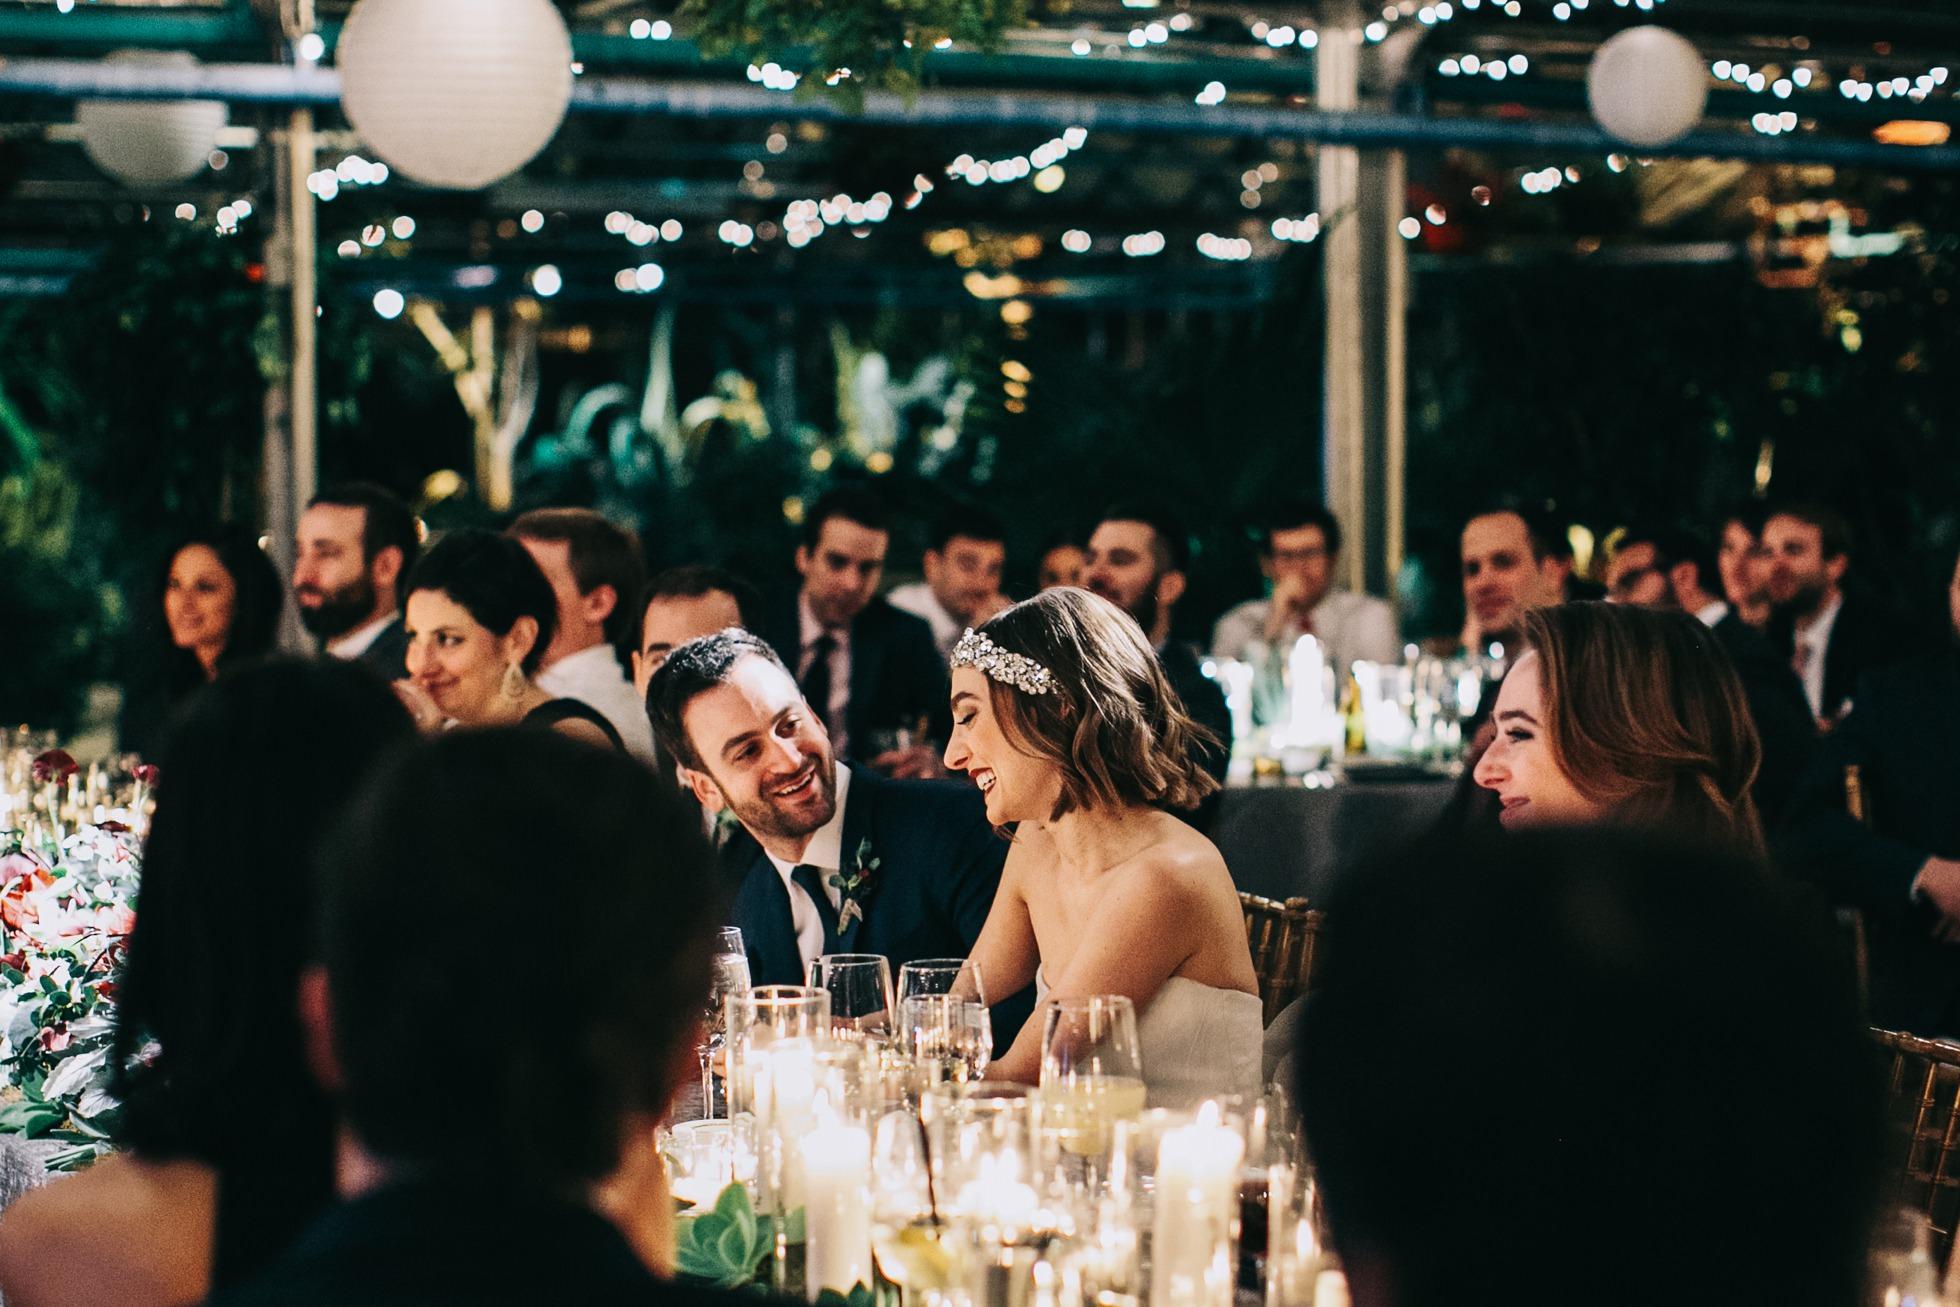 Best Unique Wedding Venues - Philadelphia Fairmount Horticultural Center Greenhouse